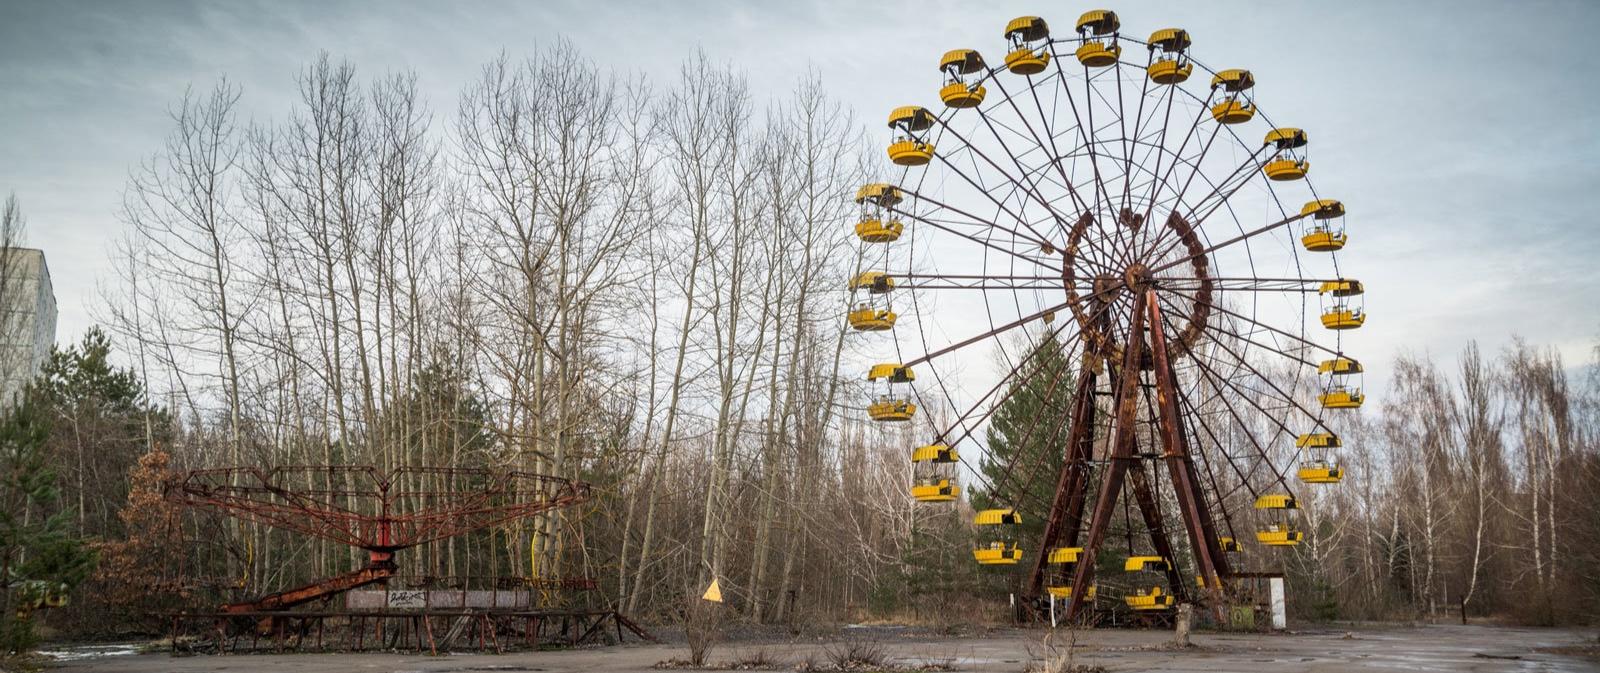 chernobyl-abandoned-ferris-wheel-CHERNOBYL0619.jpg